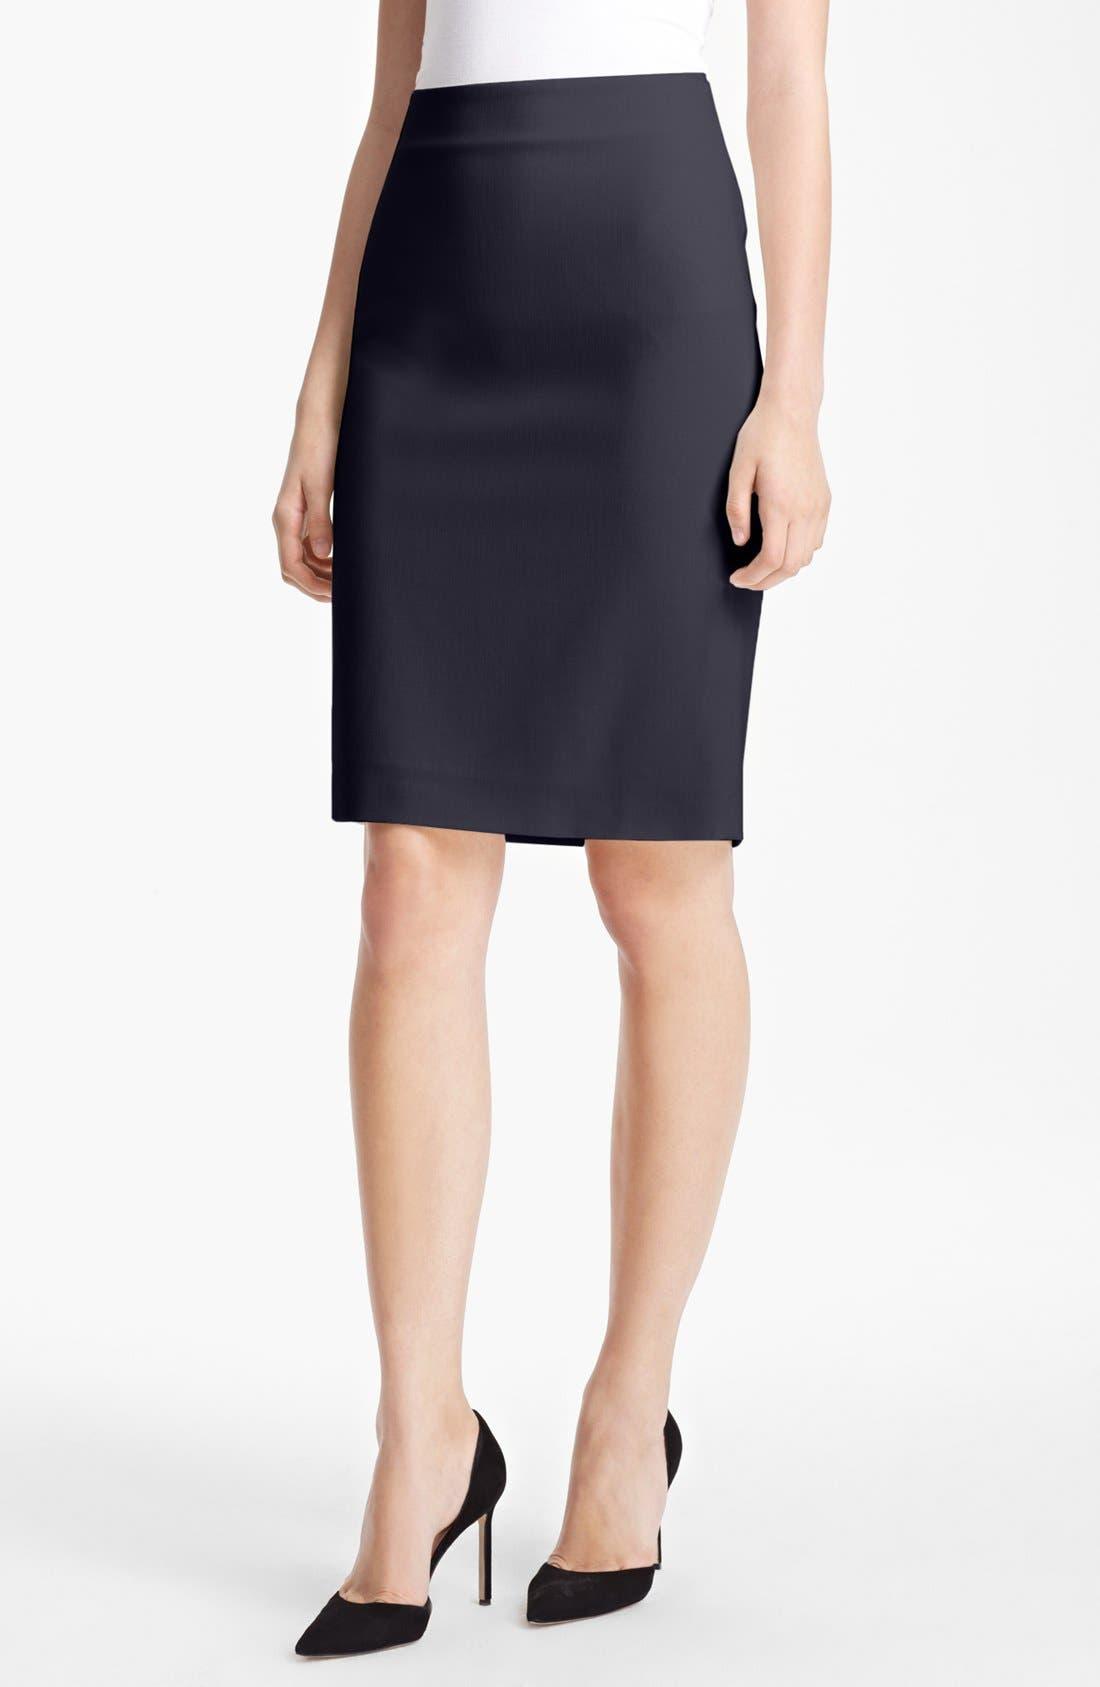 Alternate Image 1 Selected - Max Mara 'Tebano' Stretch Wool Pencil Skirt